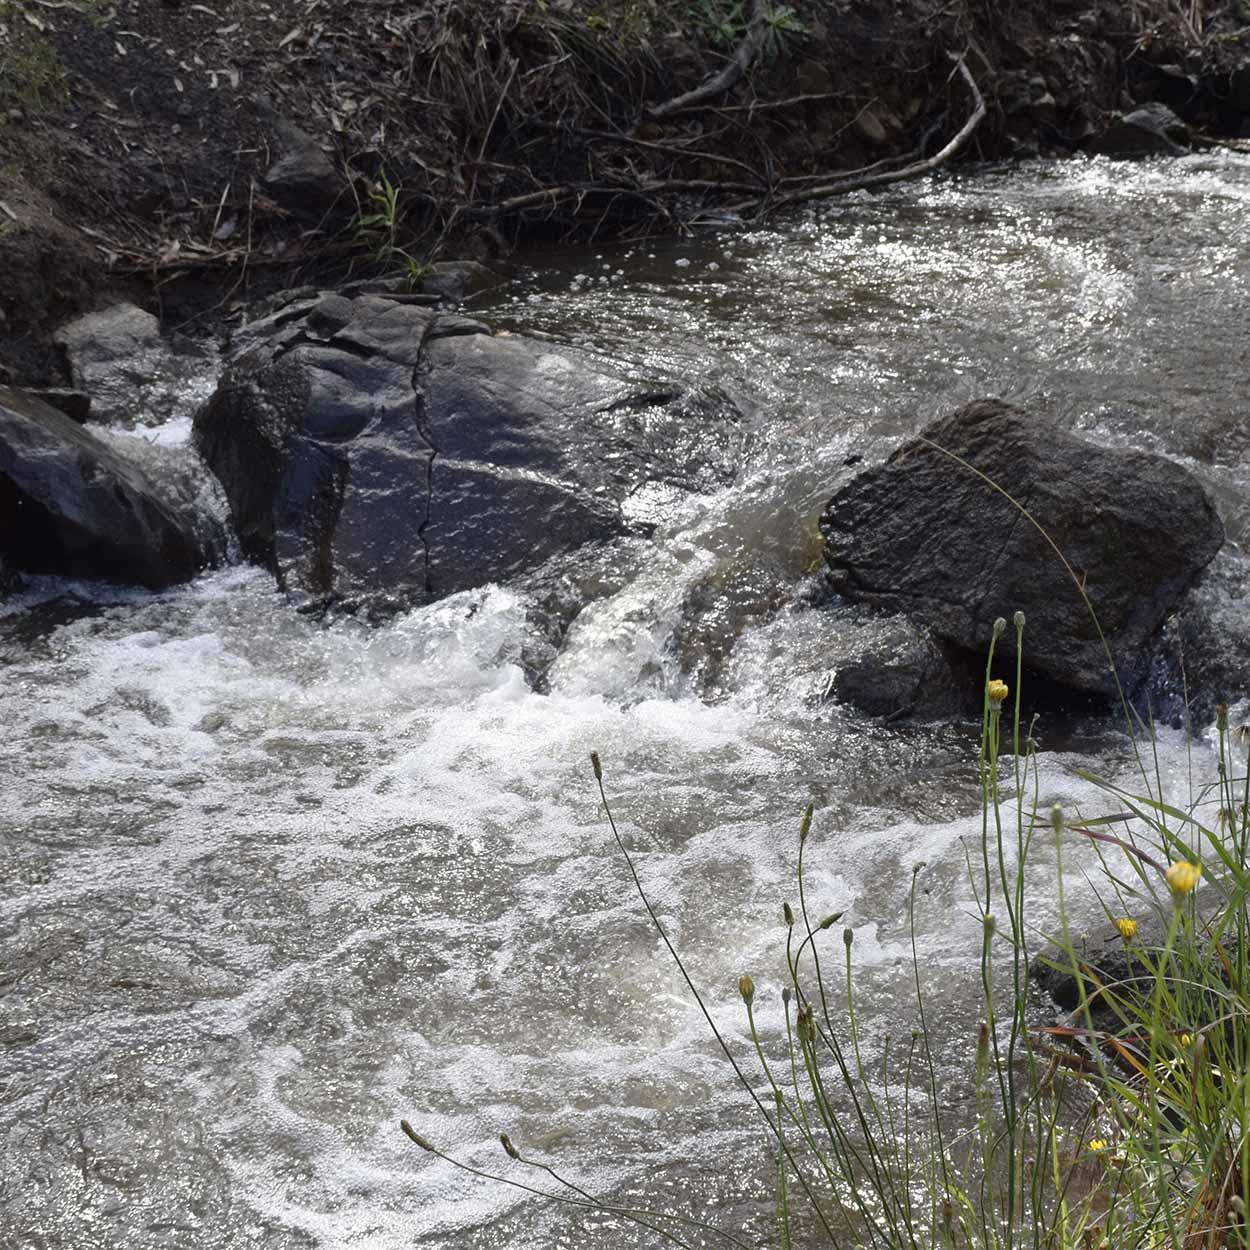 A flowing Lesmurdie Brook, Mundy Regional Park, Perth, Western Australia